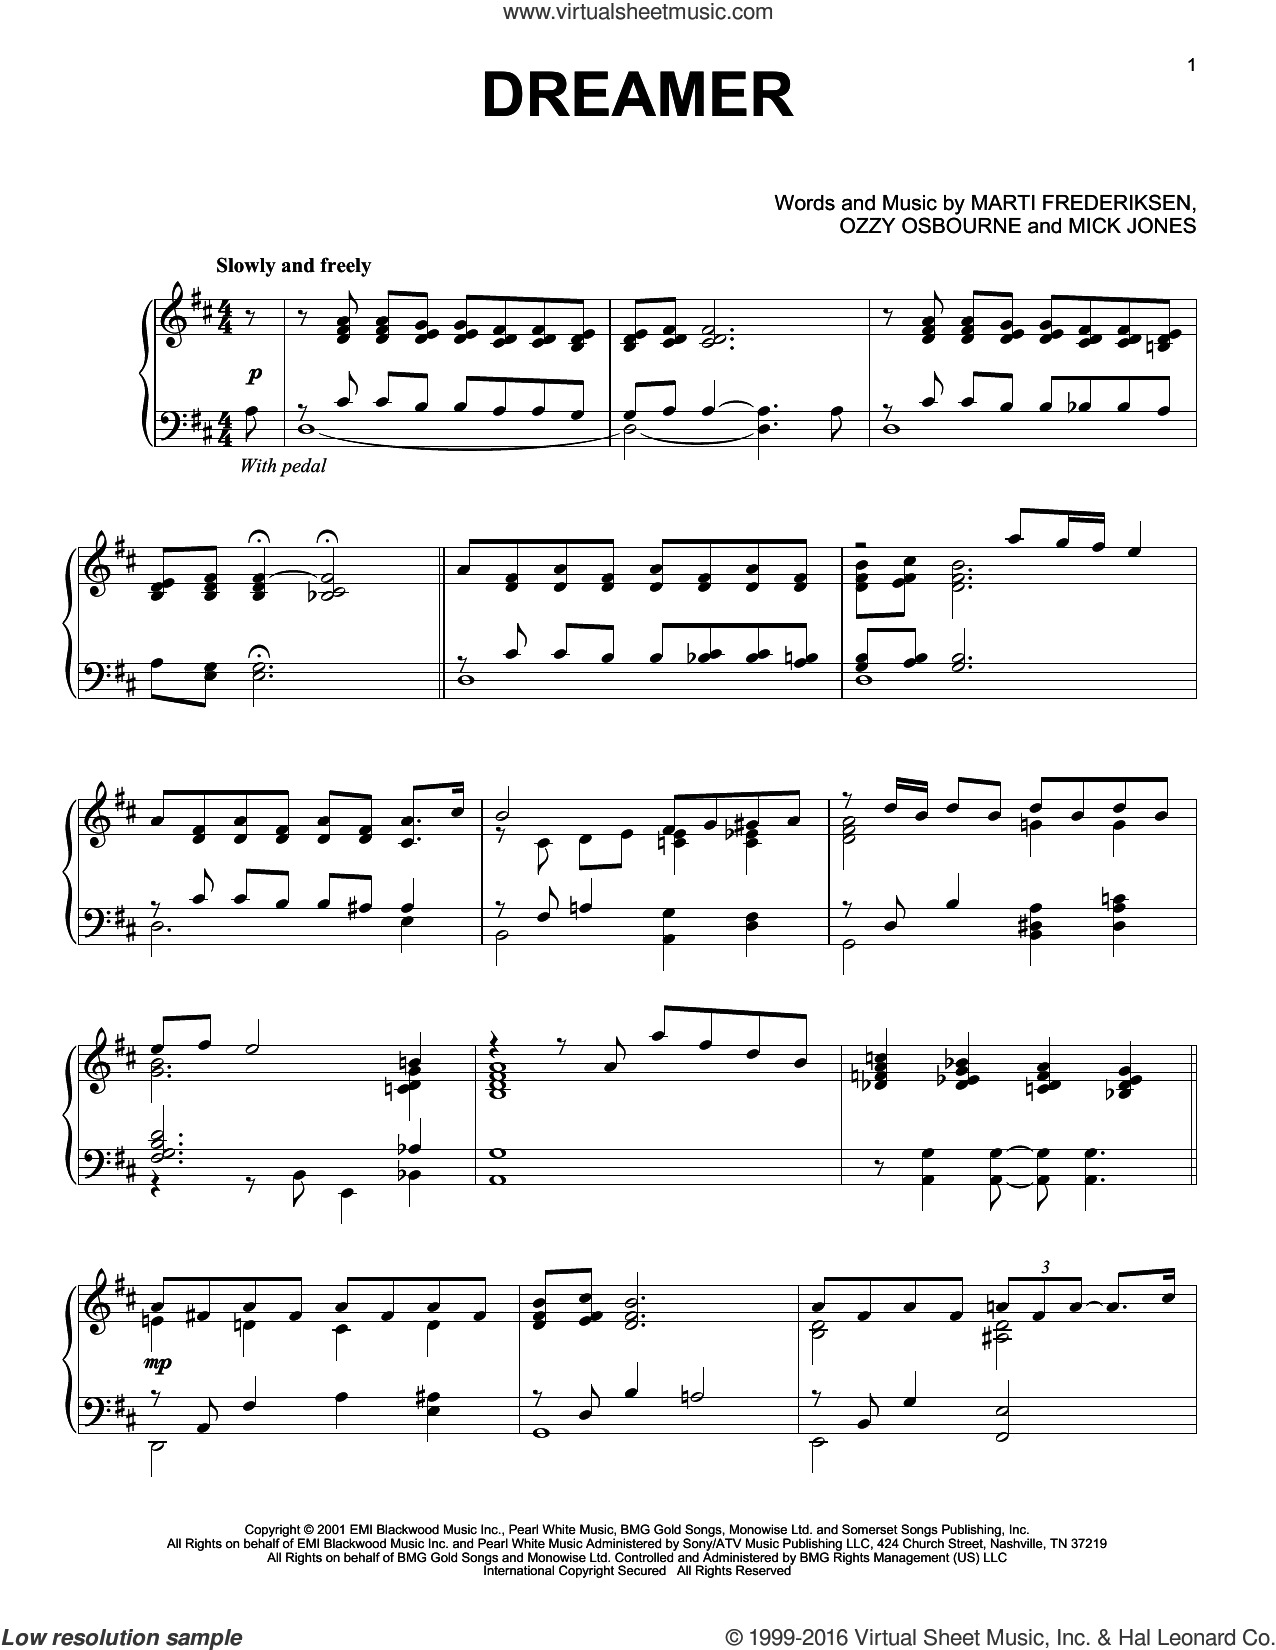 Dreamer [Jazz version] sheet music for piano solo by Ozzy Osbourne, Marti Frederiksen and Mick Jones, intermediate skill level